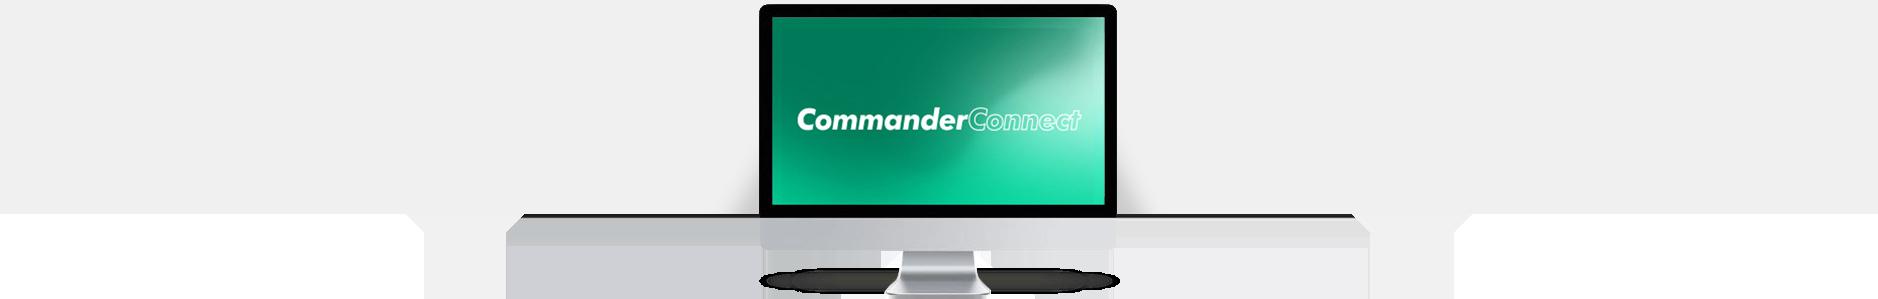 Commander Connect Grey